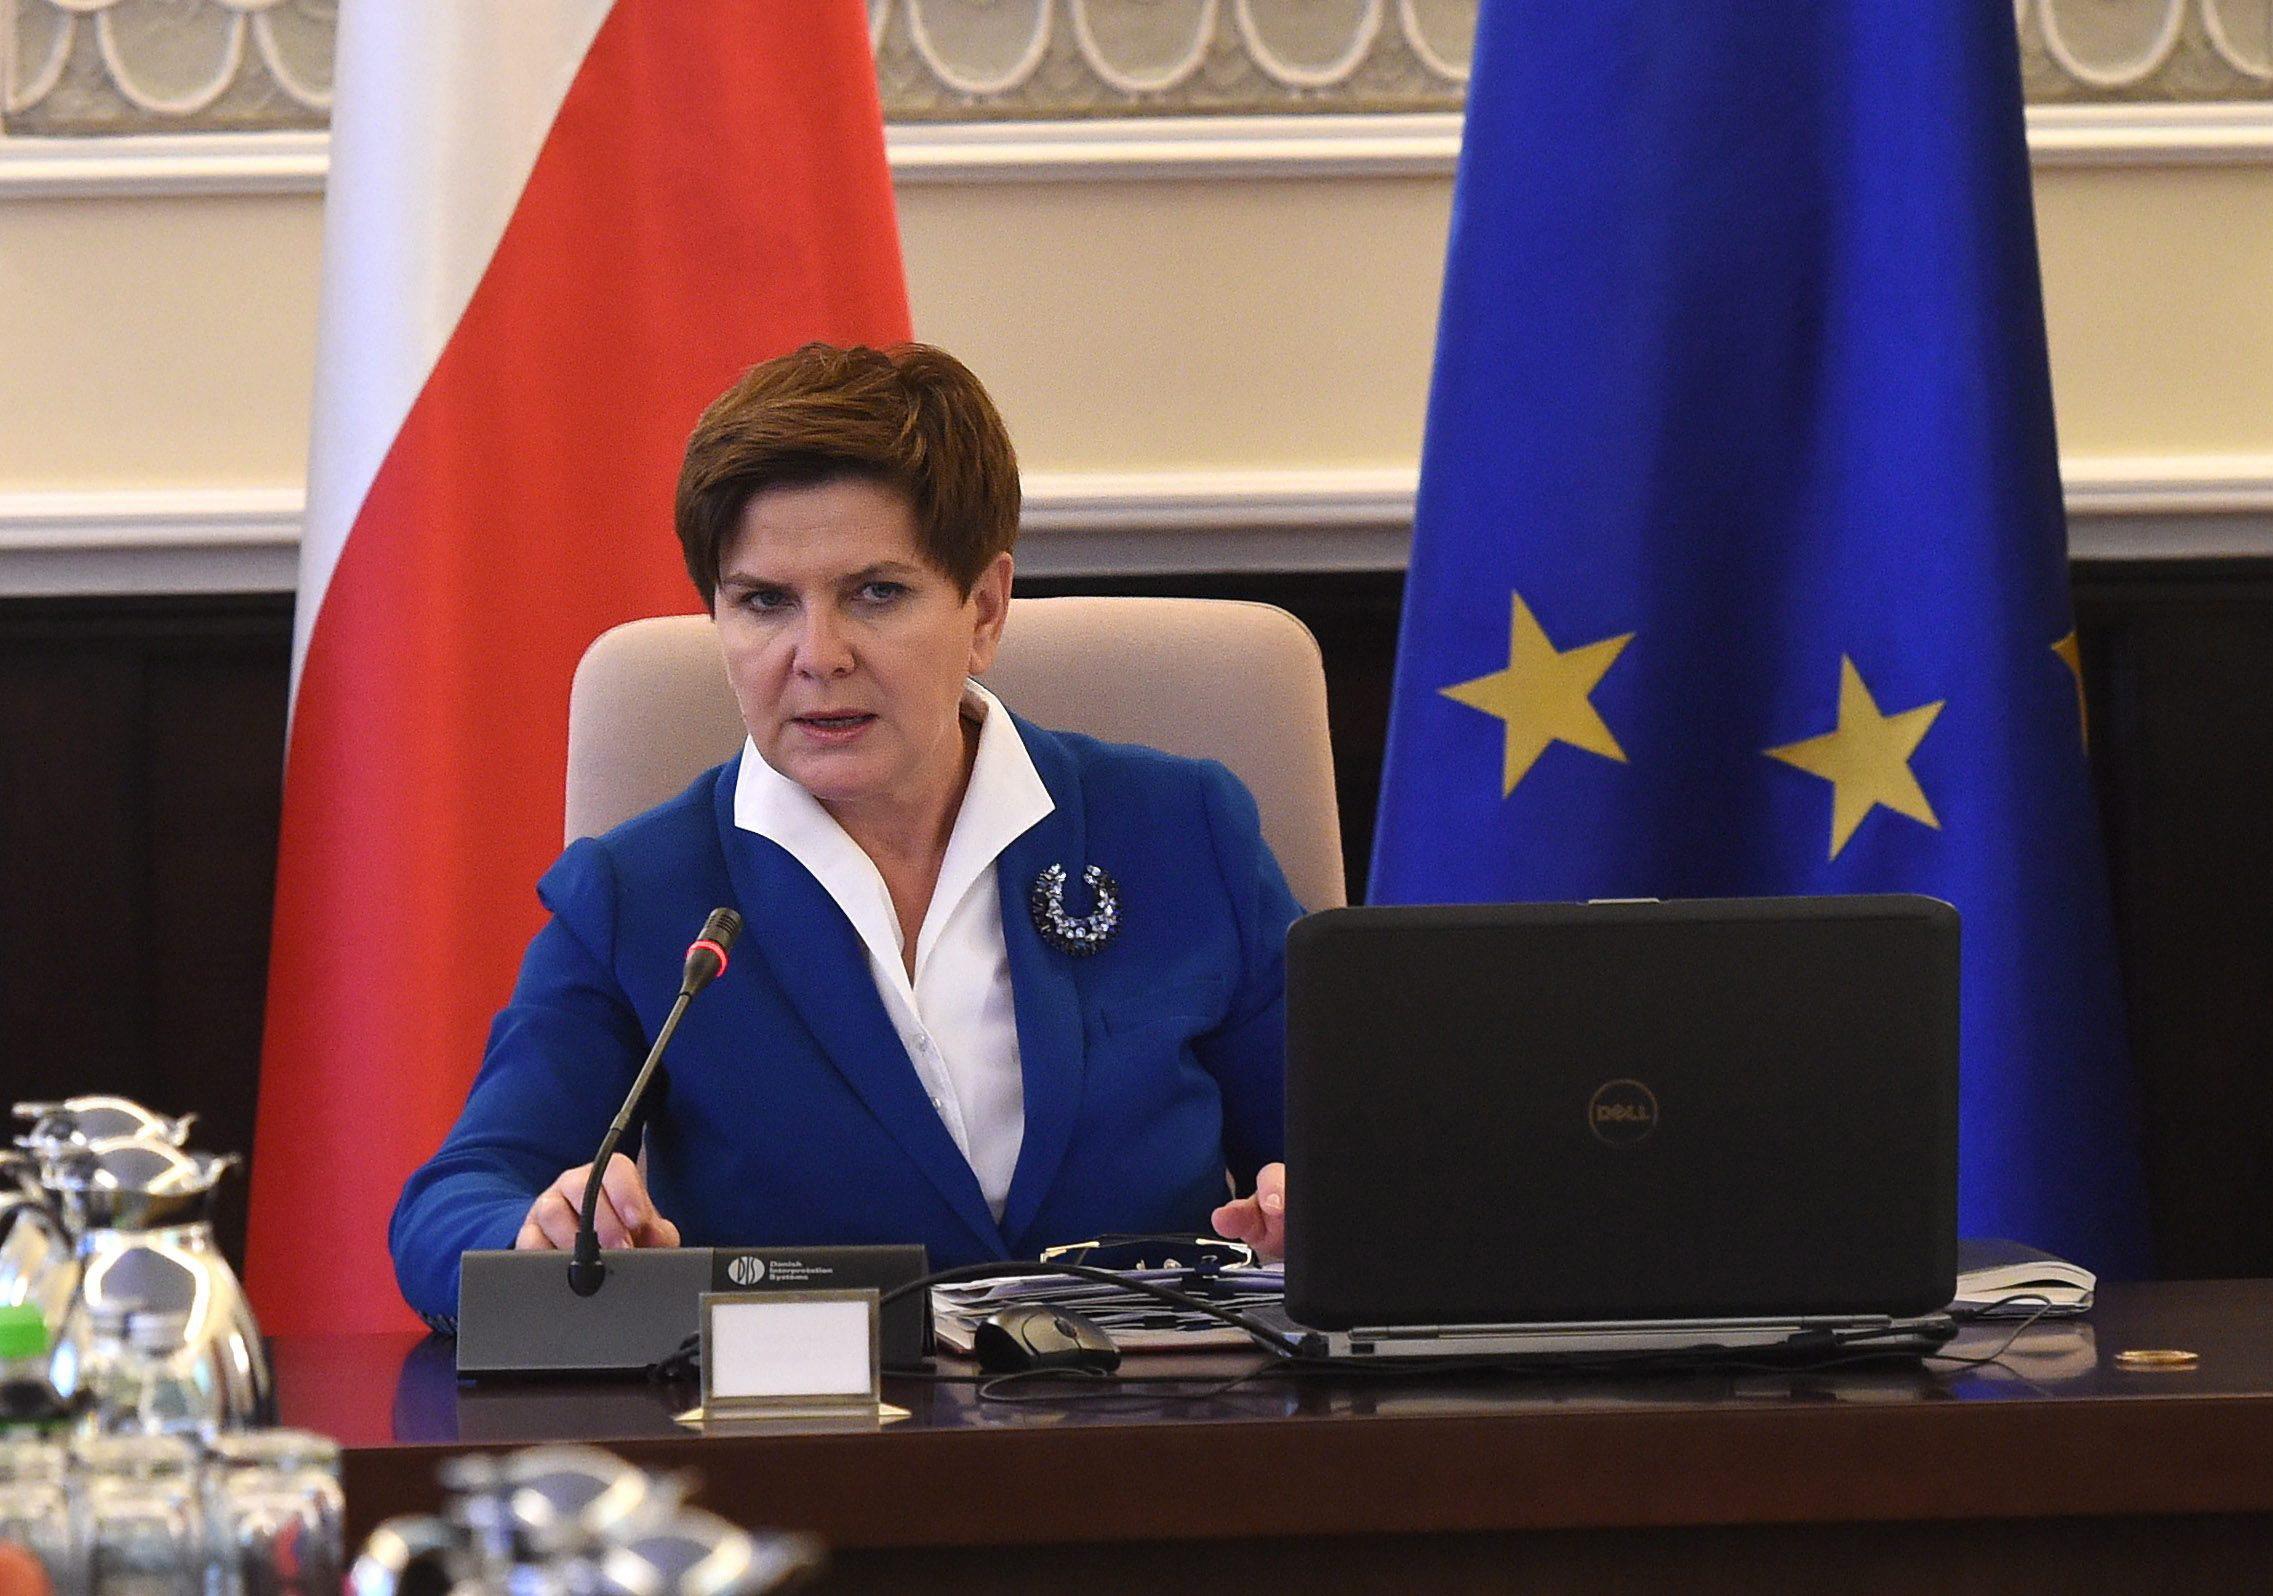 EU-Parlamentarier: Demokratie in Polen in Gefahr